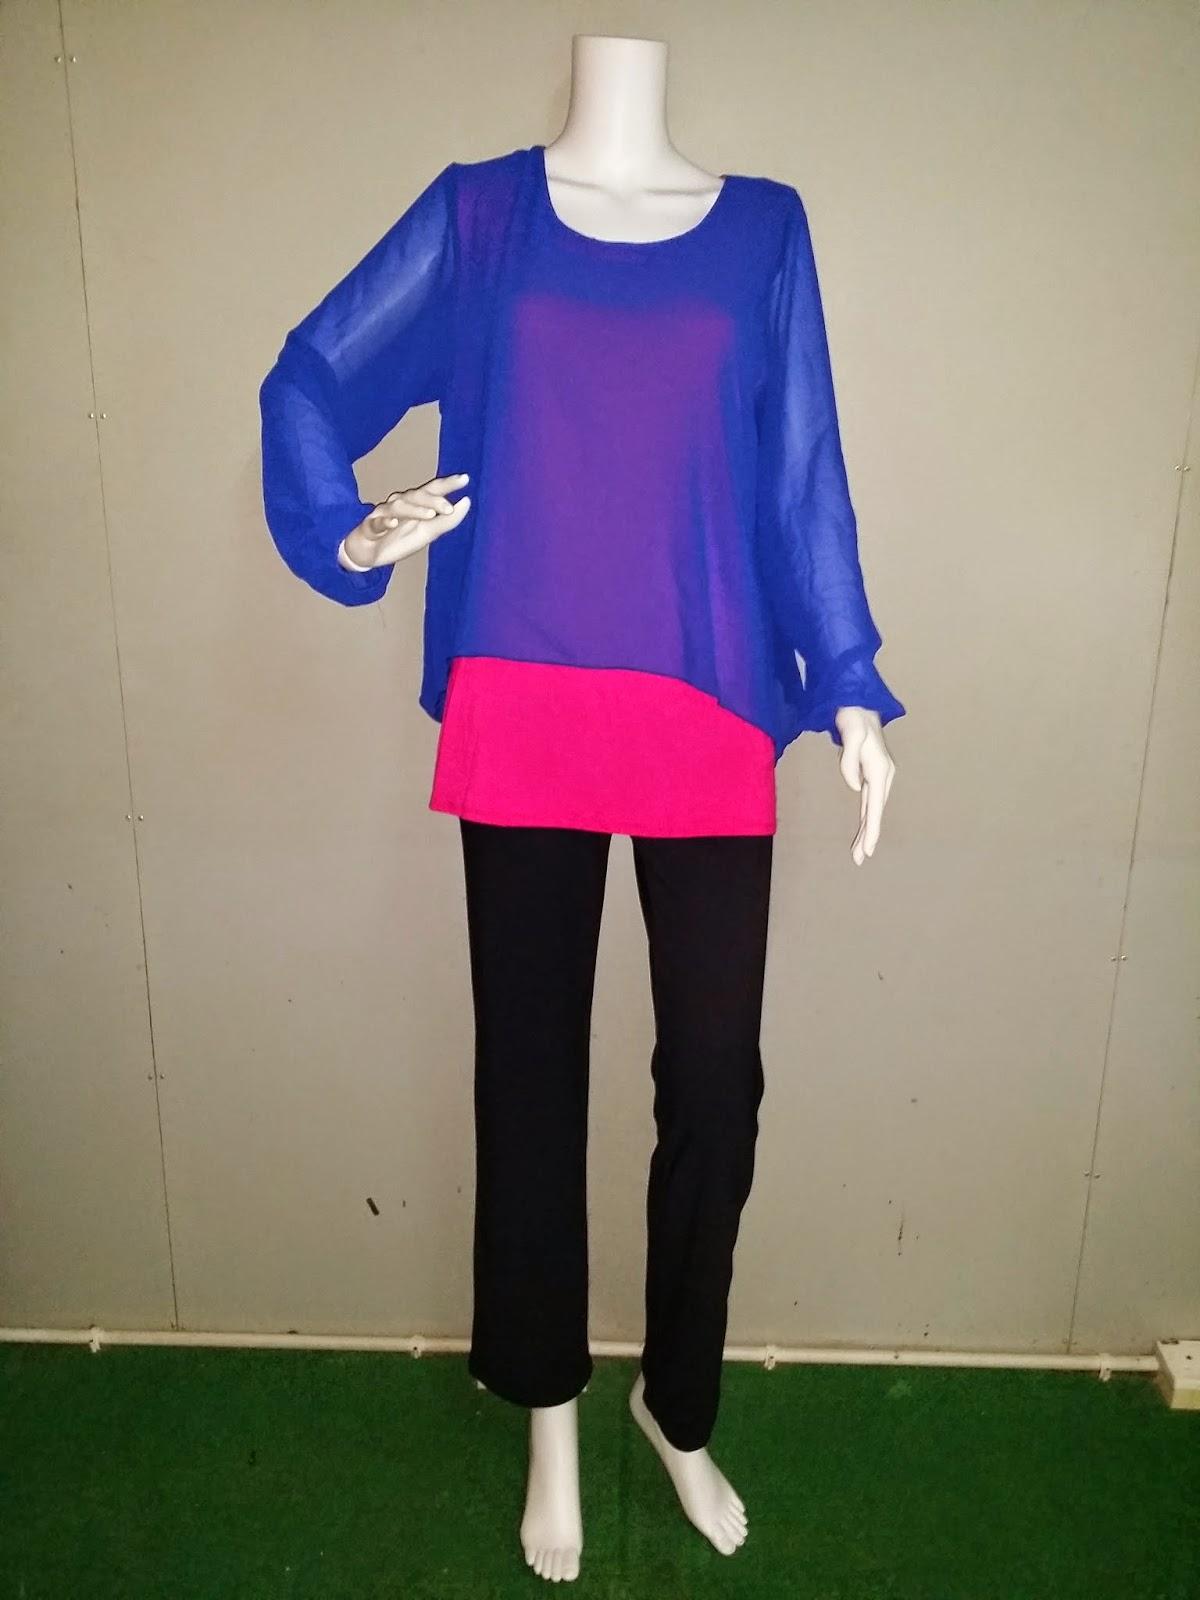 blouse, blouse cantik dan murah, blouse plain, blog jual blous, blog jual pakaian online, blog jual baju murah, blog jual blouse online,